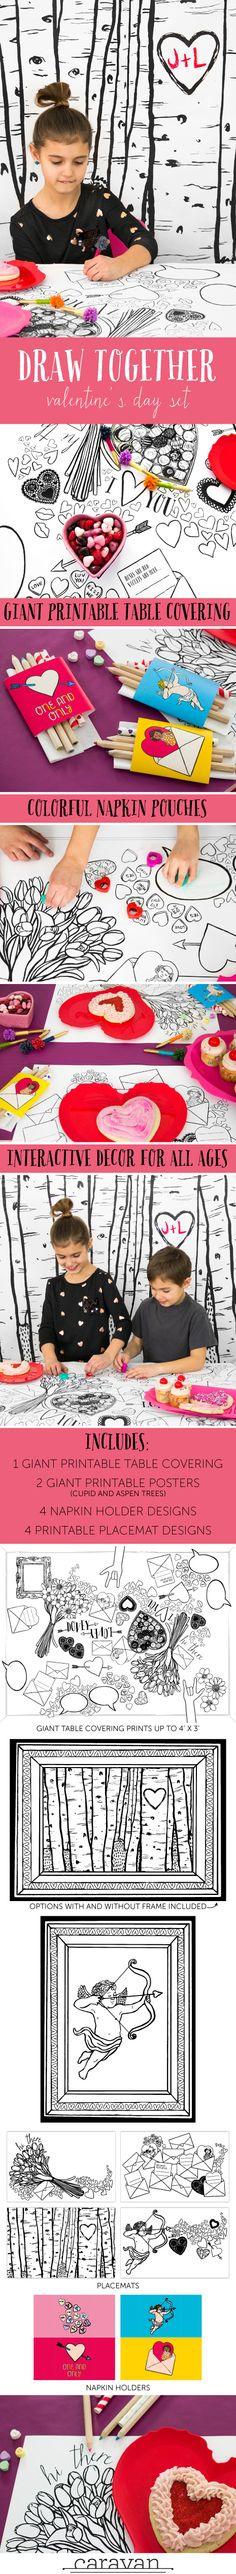 10 Free Printable Non Candy Valentines | Free printable